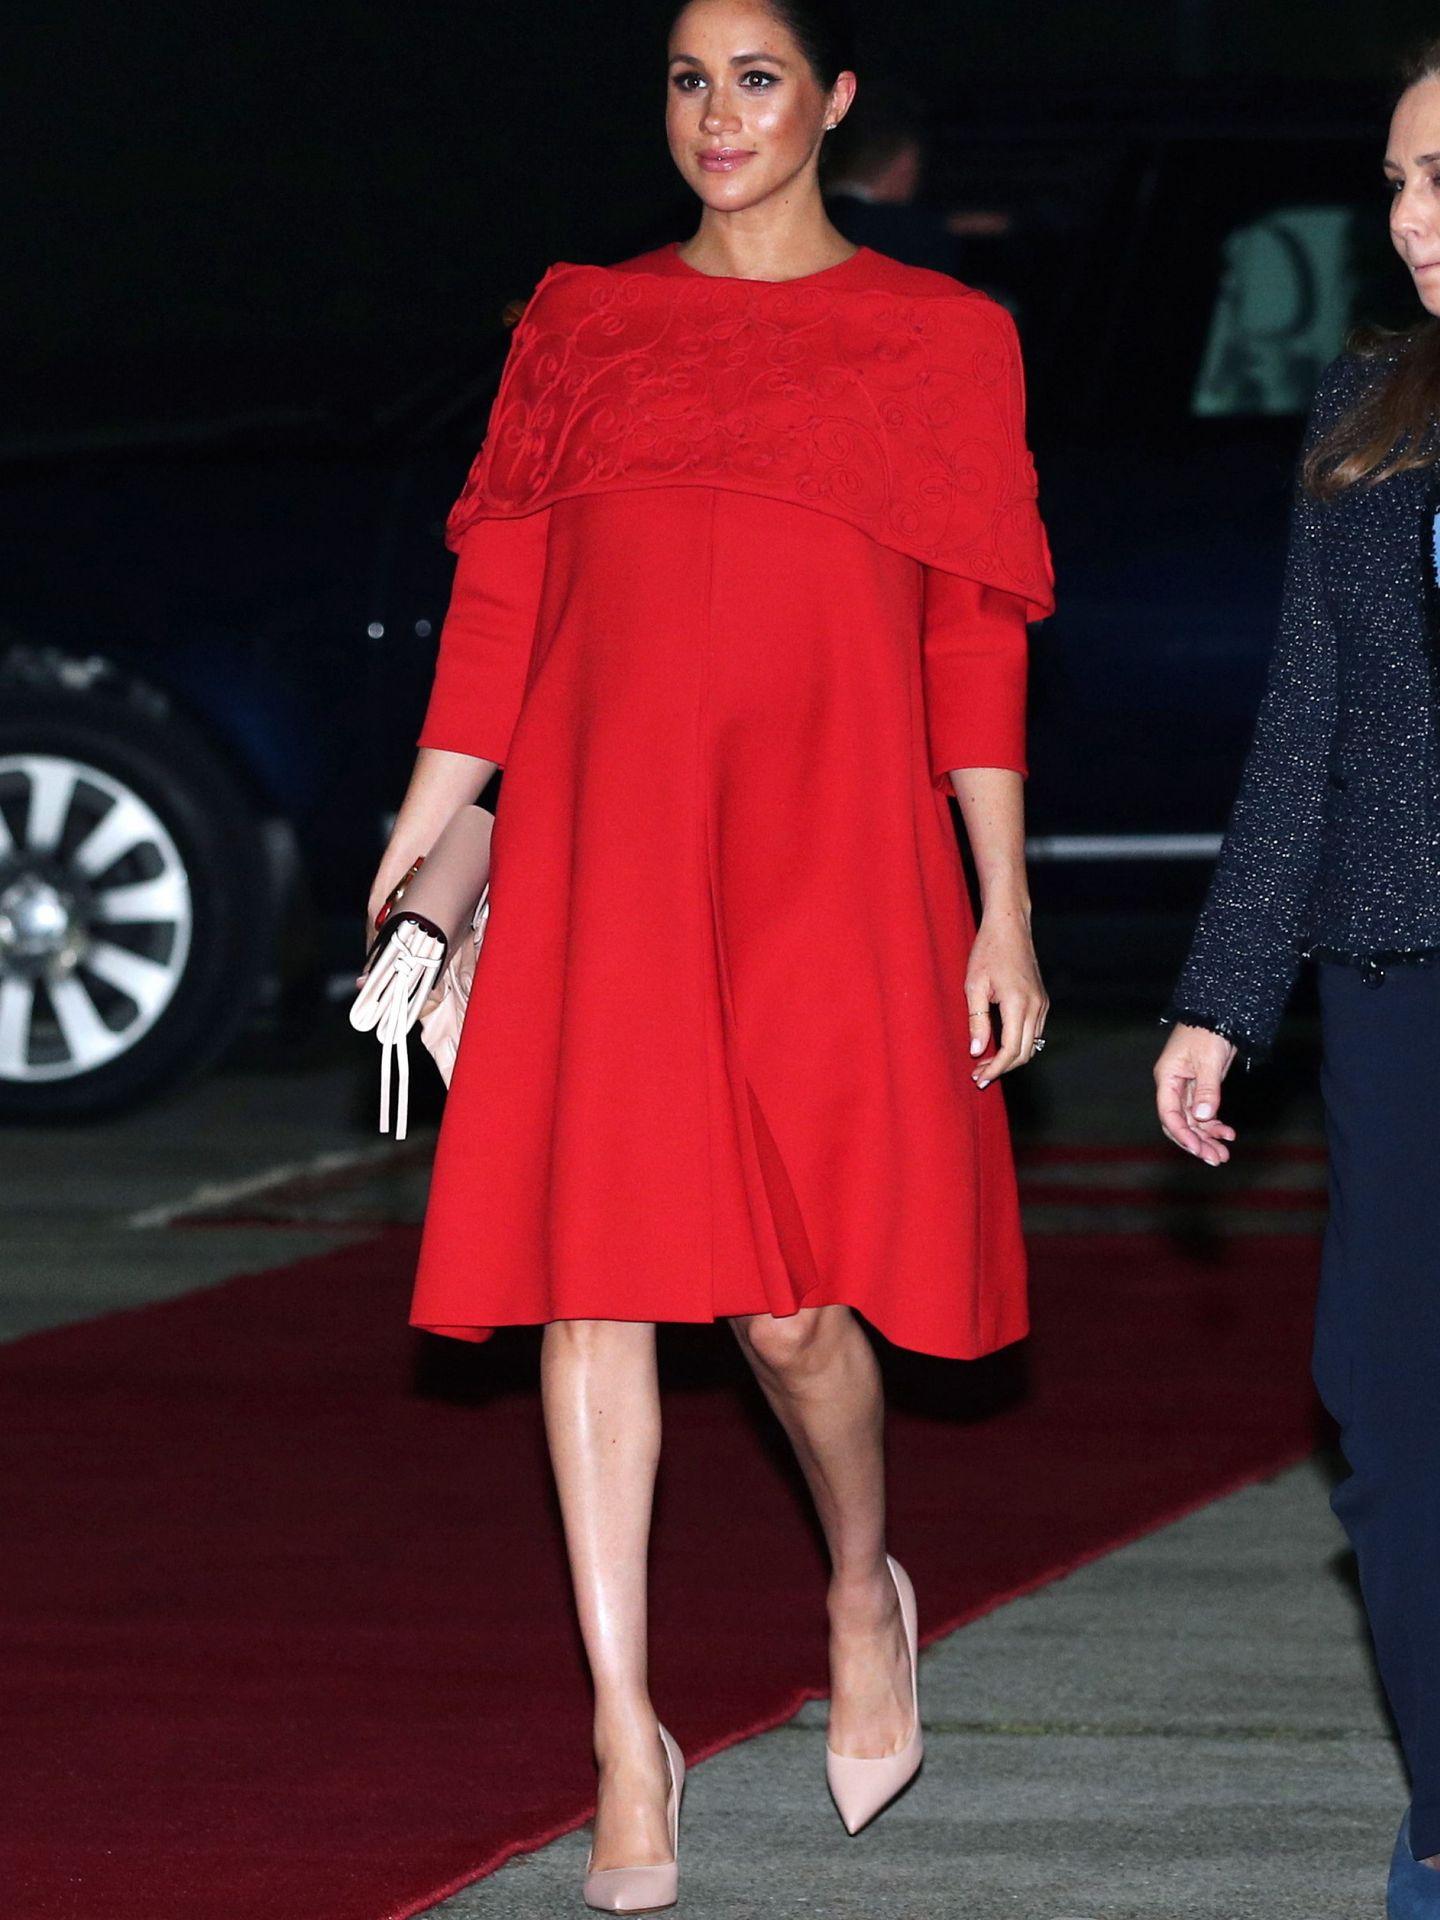 La duquesa en Marruecos. (Getty)